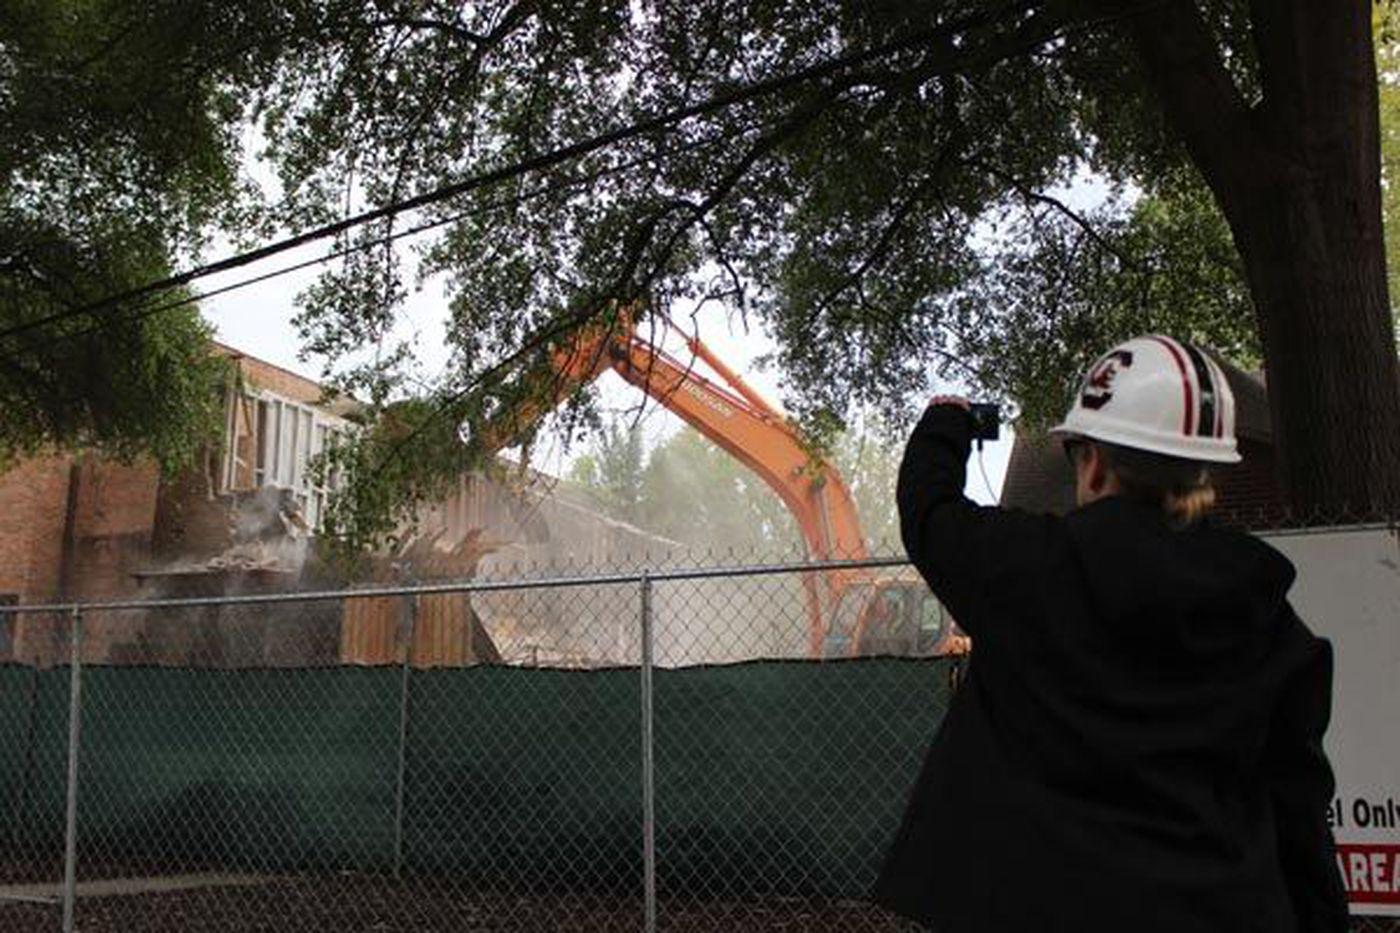 Demolition of Workshop Theatre begins ahead of USC Law School ...